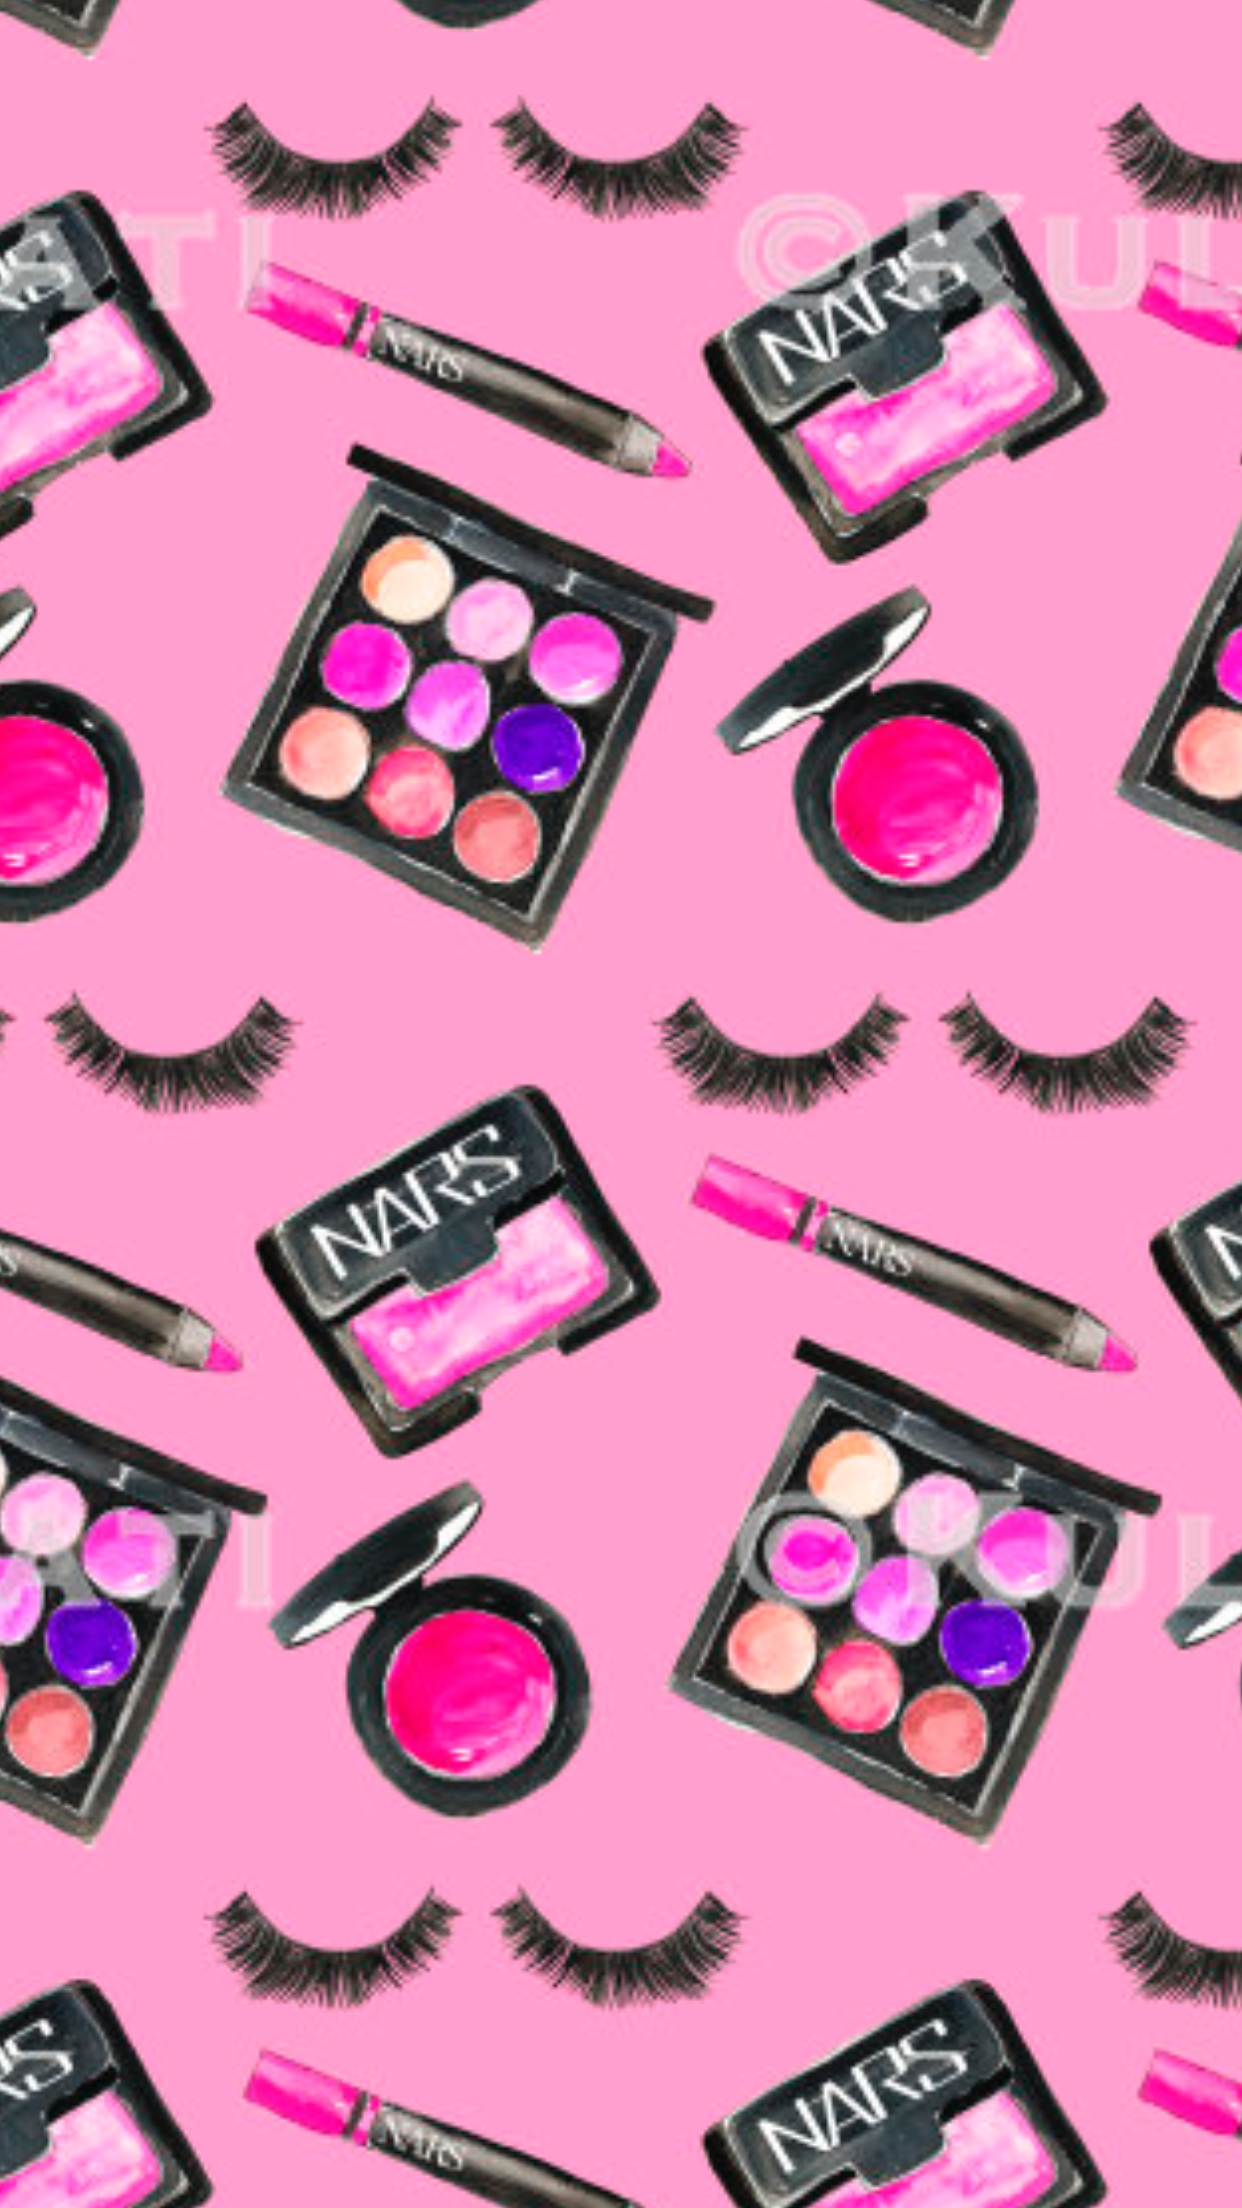 Cute Makeup Wallpapers - Top Free Cute Makeup Backgrounds ...